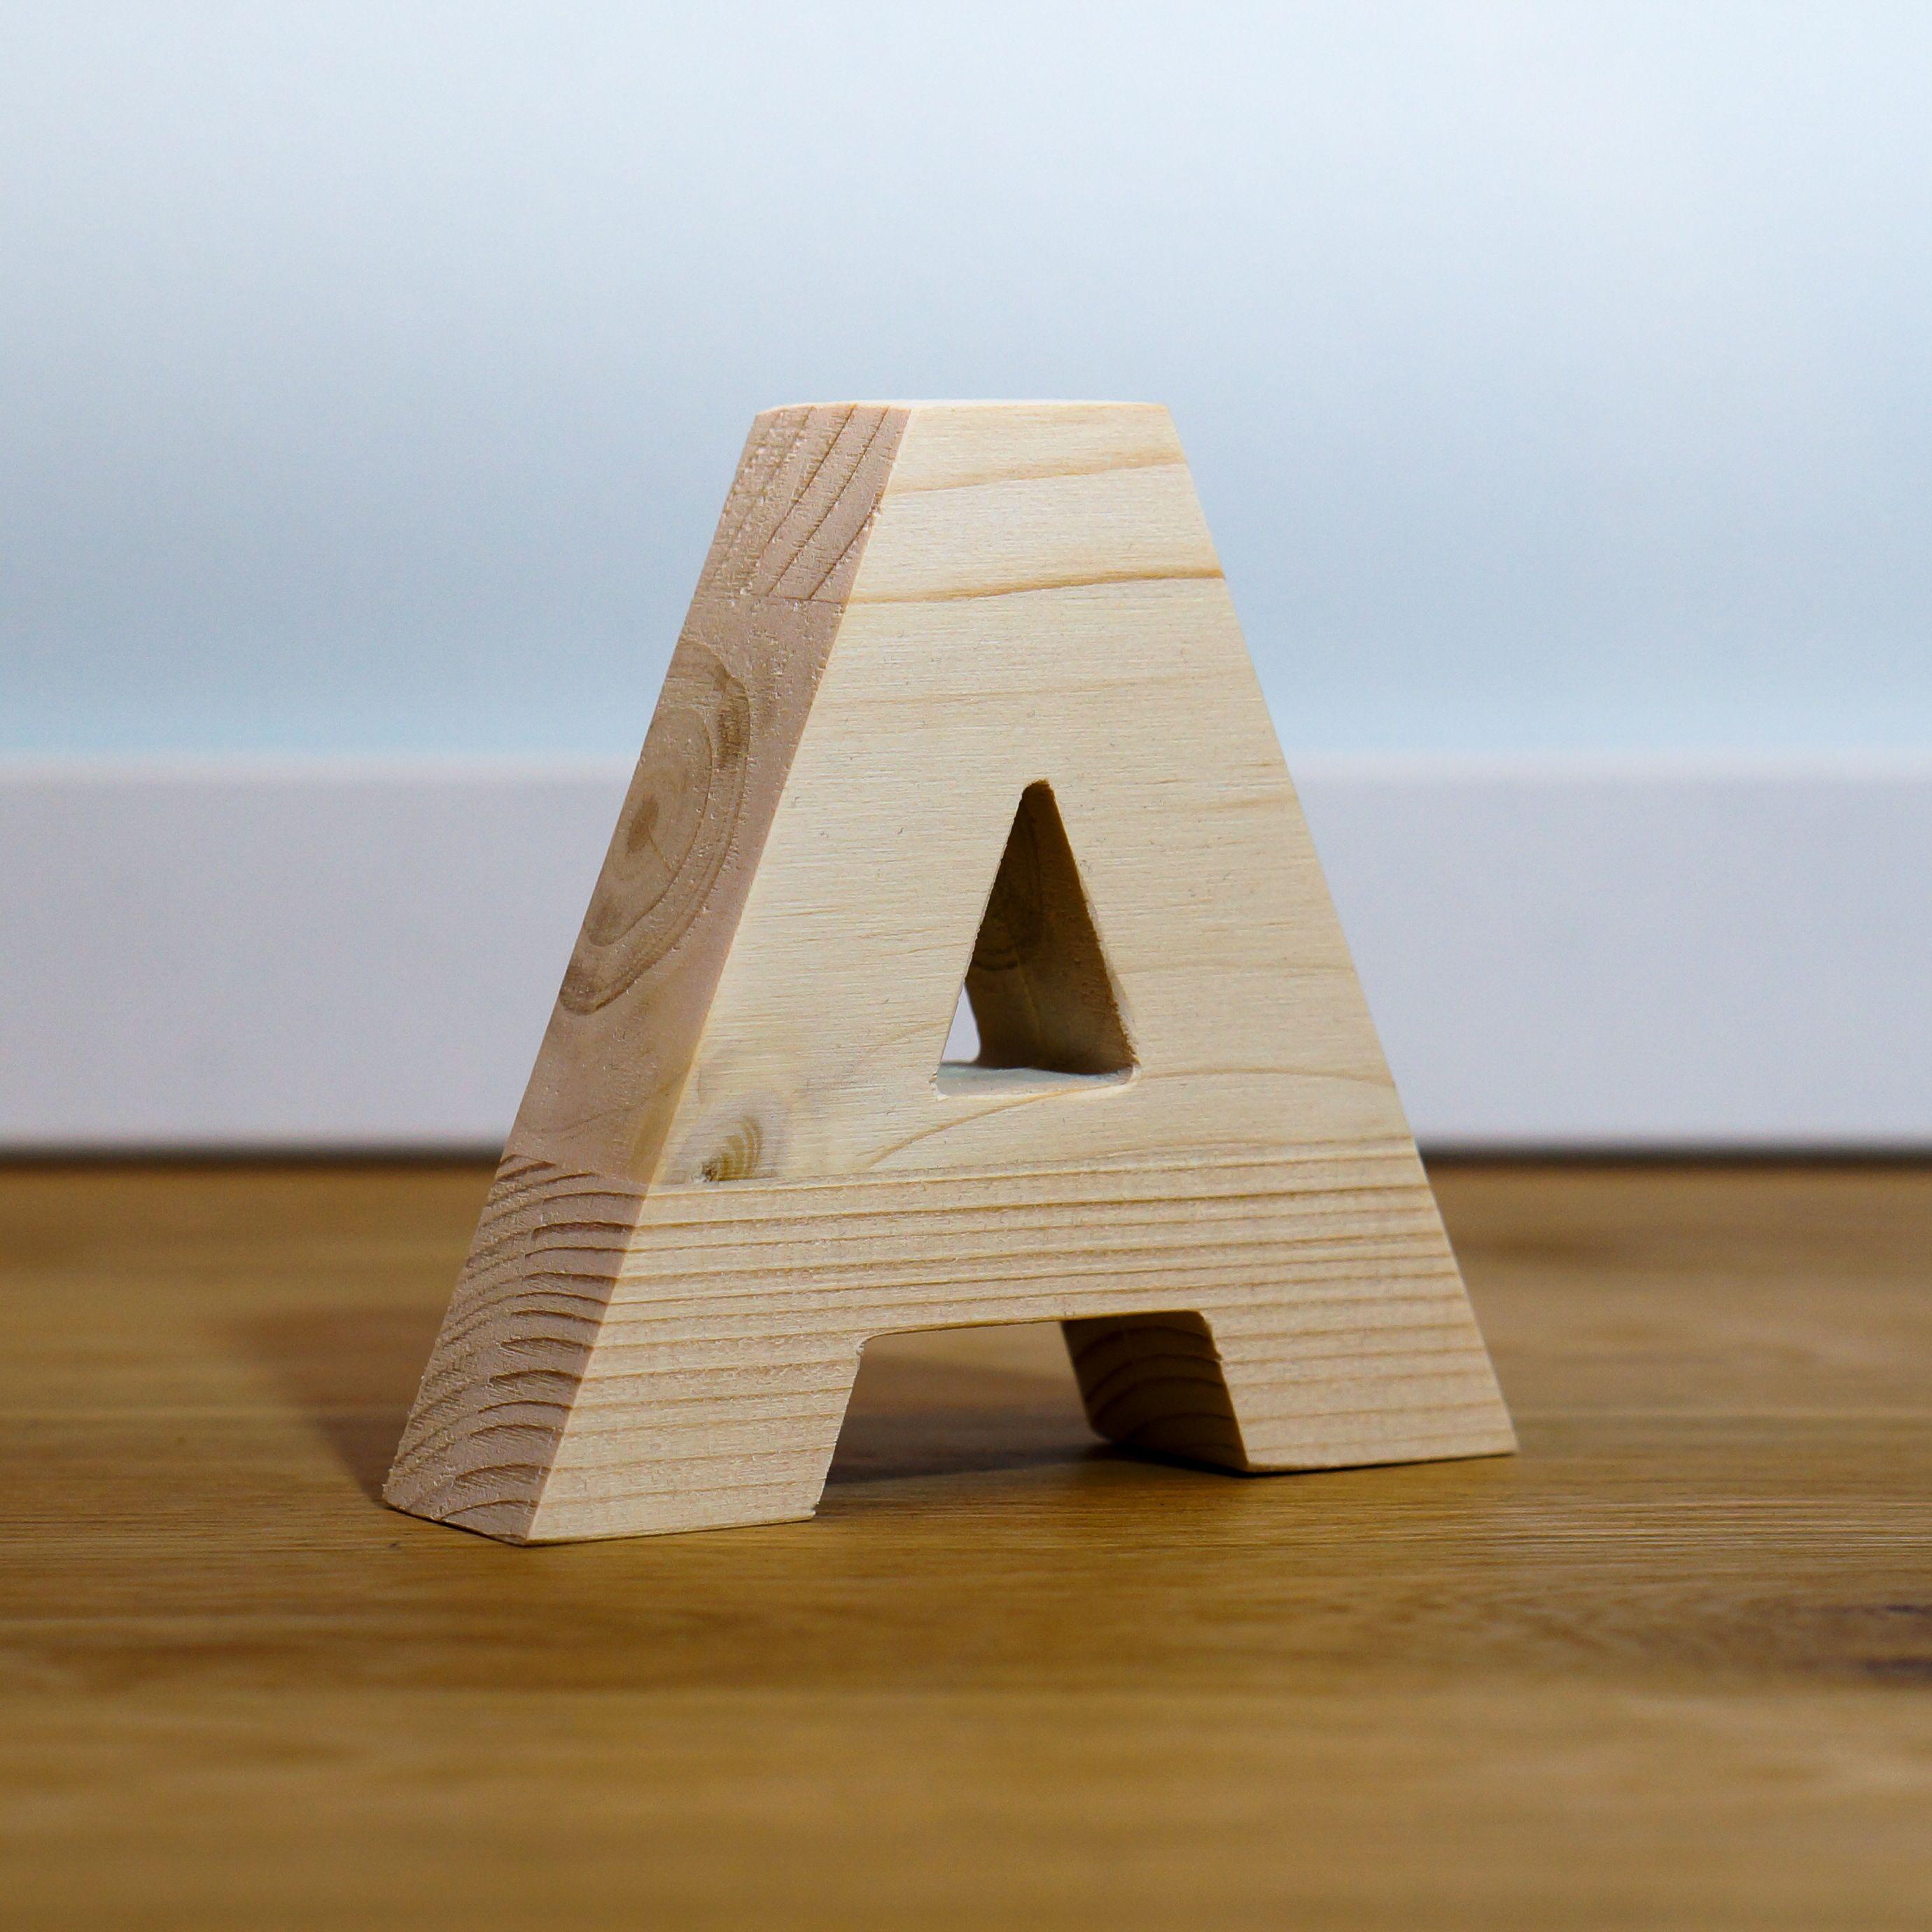 Holzbuchstaben Natur Schriftzug Aus Holz Personalisiert Buch